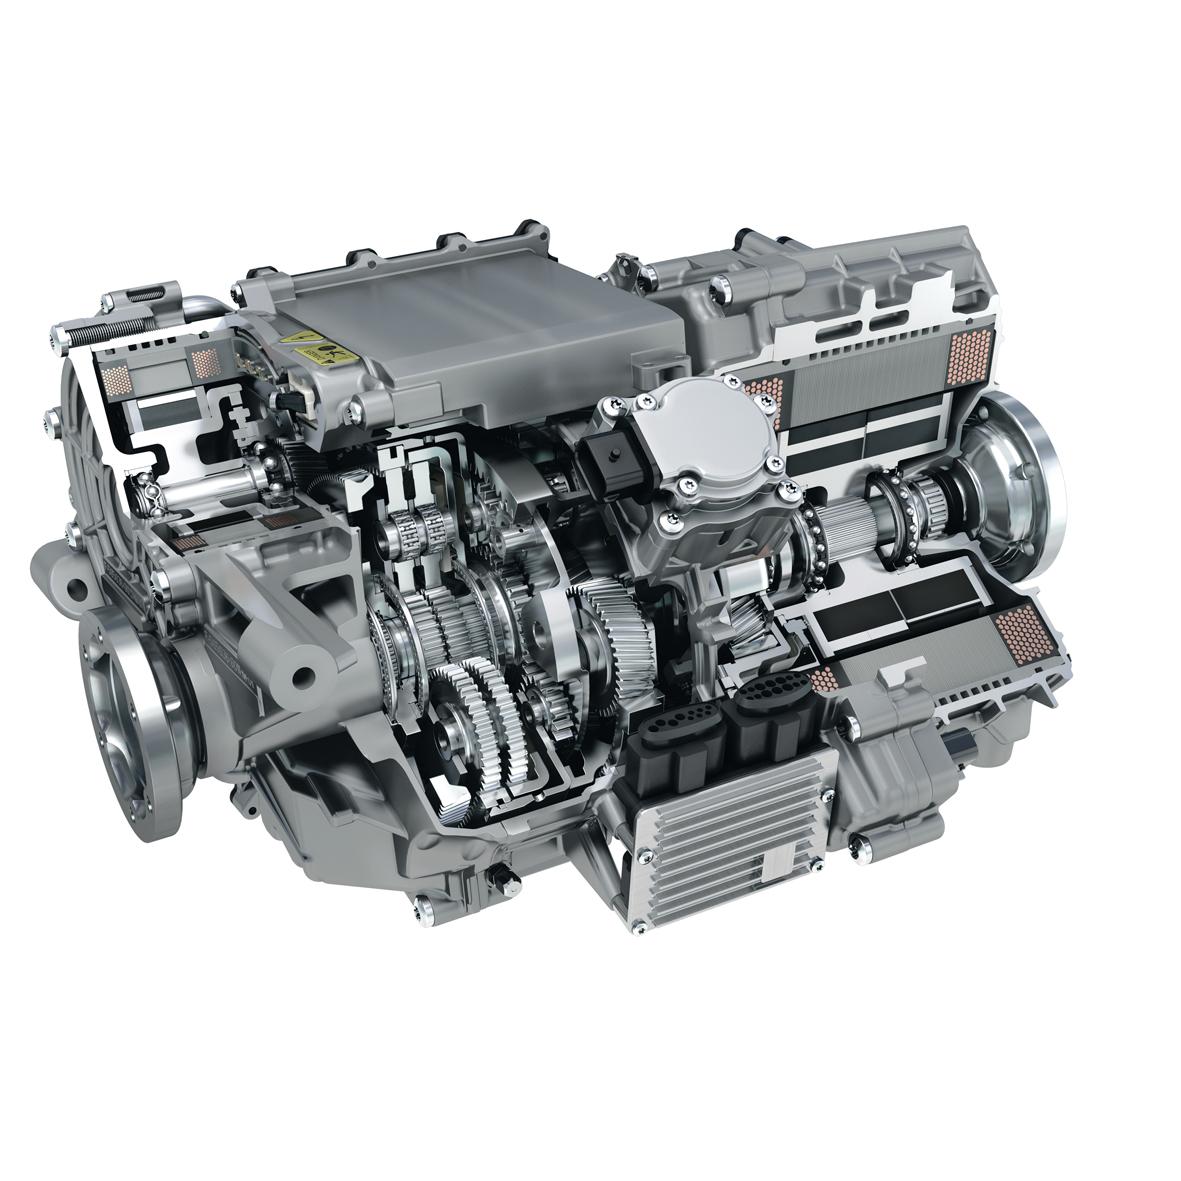 2013 Smart Fortwo Electric Drive Transmission: Schaeffler North America